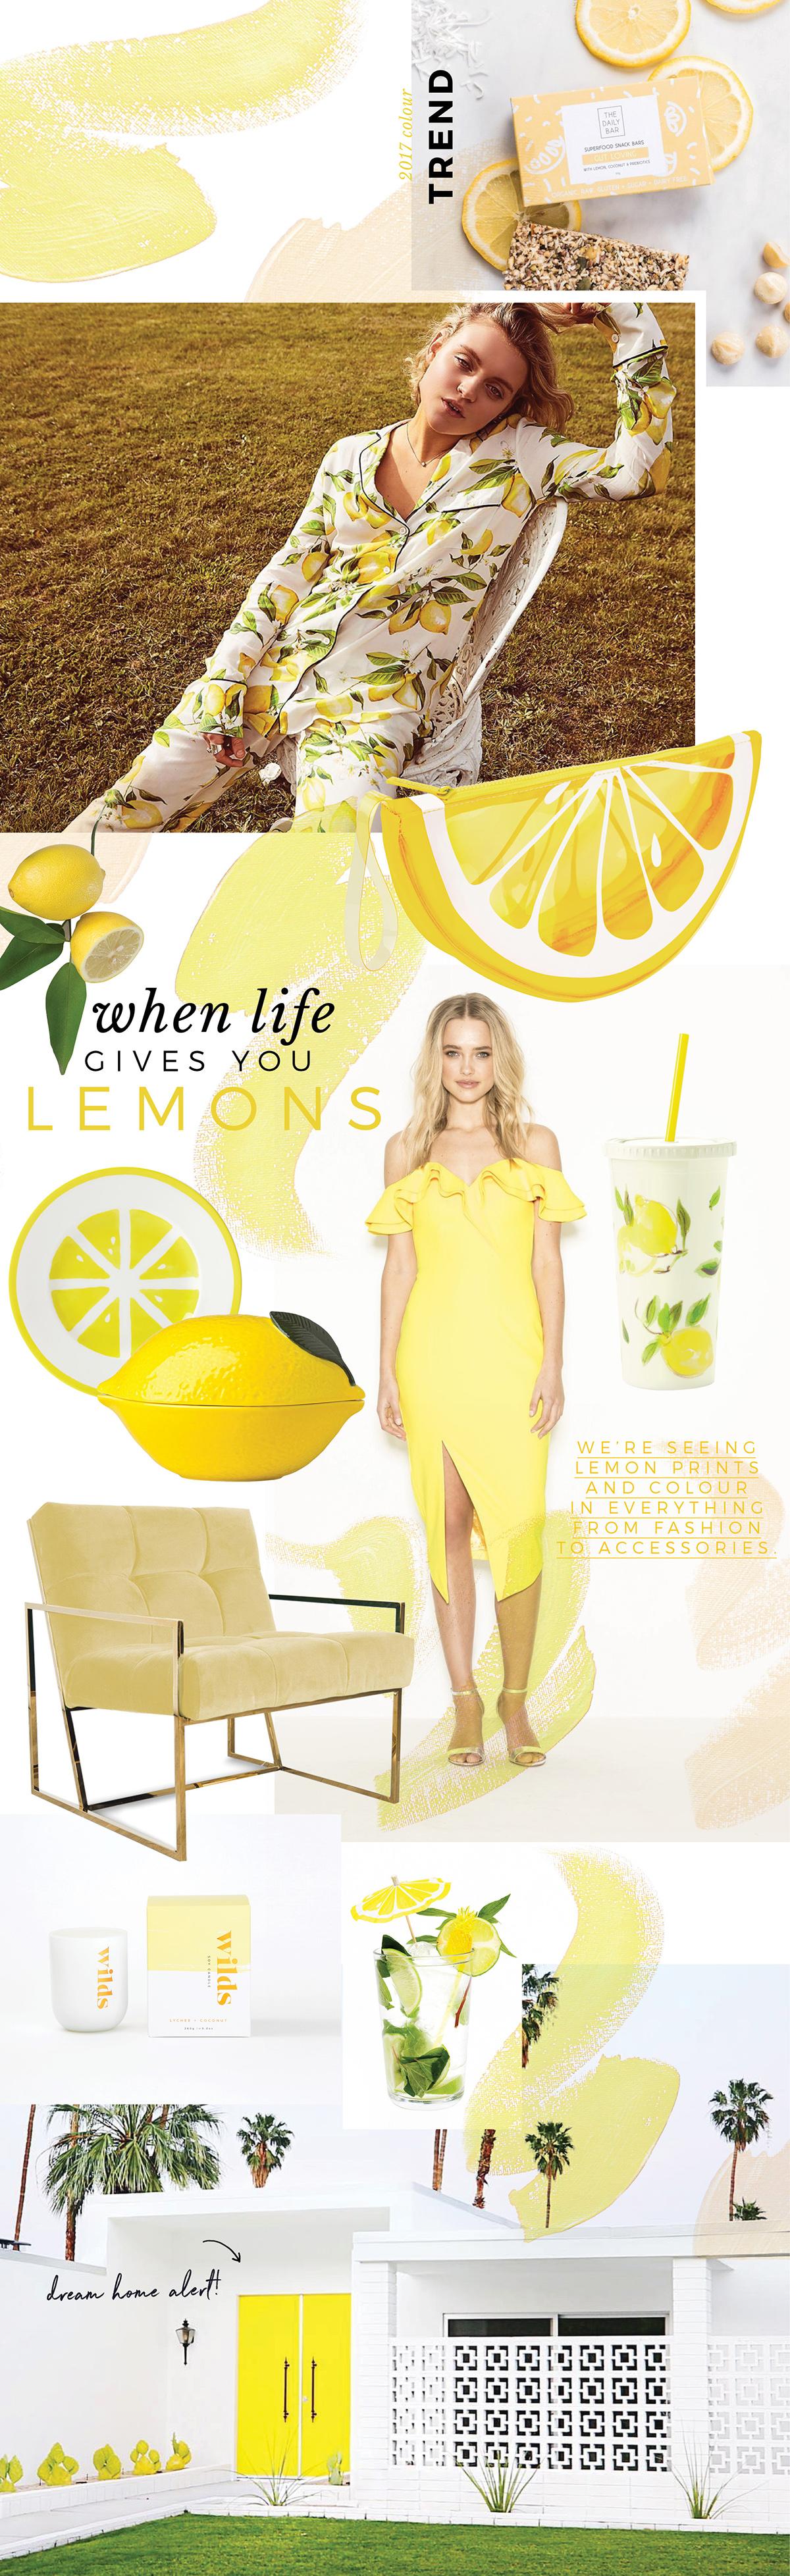 adore_home_blog_life_gives_you_lemons_make_lemondade_yellow_fun_bright_happy_palmsprings_fashion.jpg